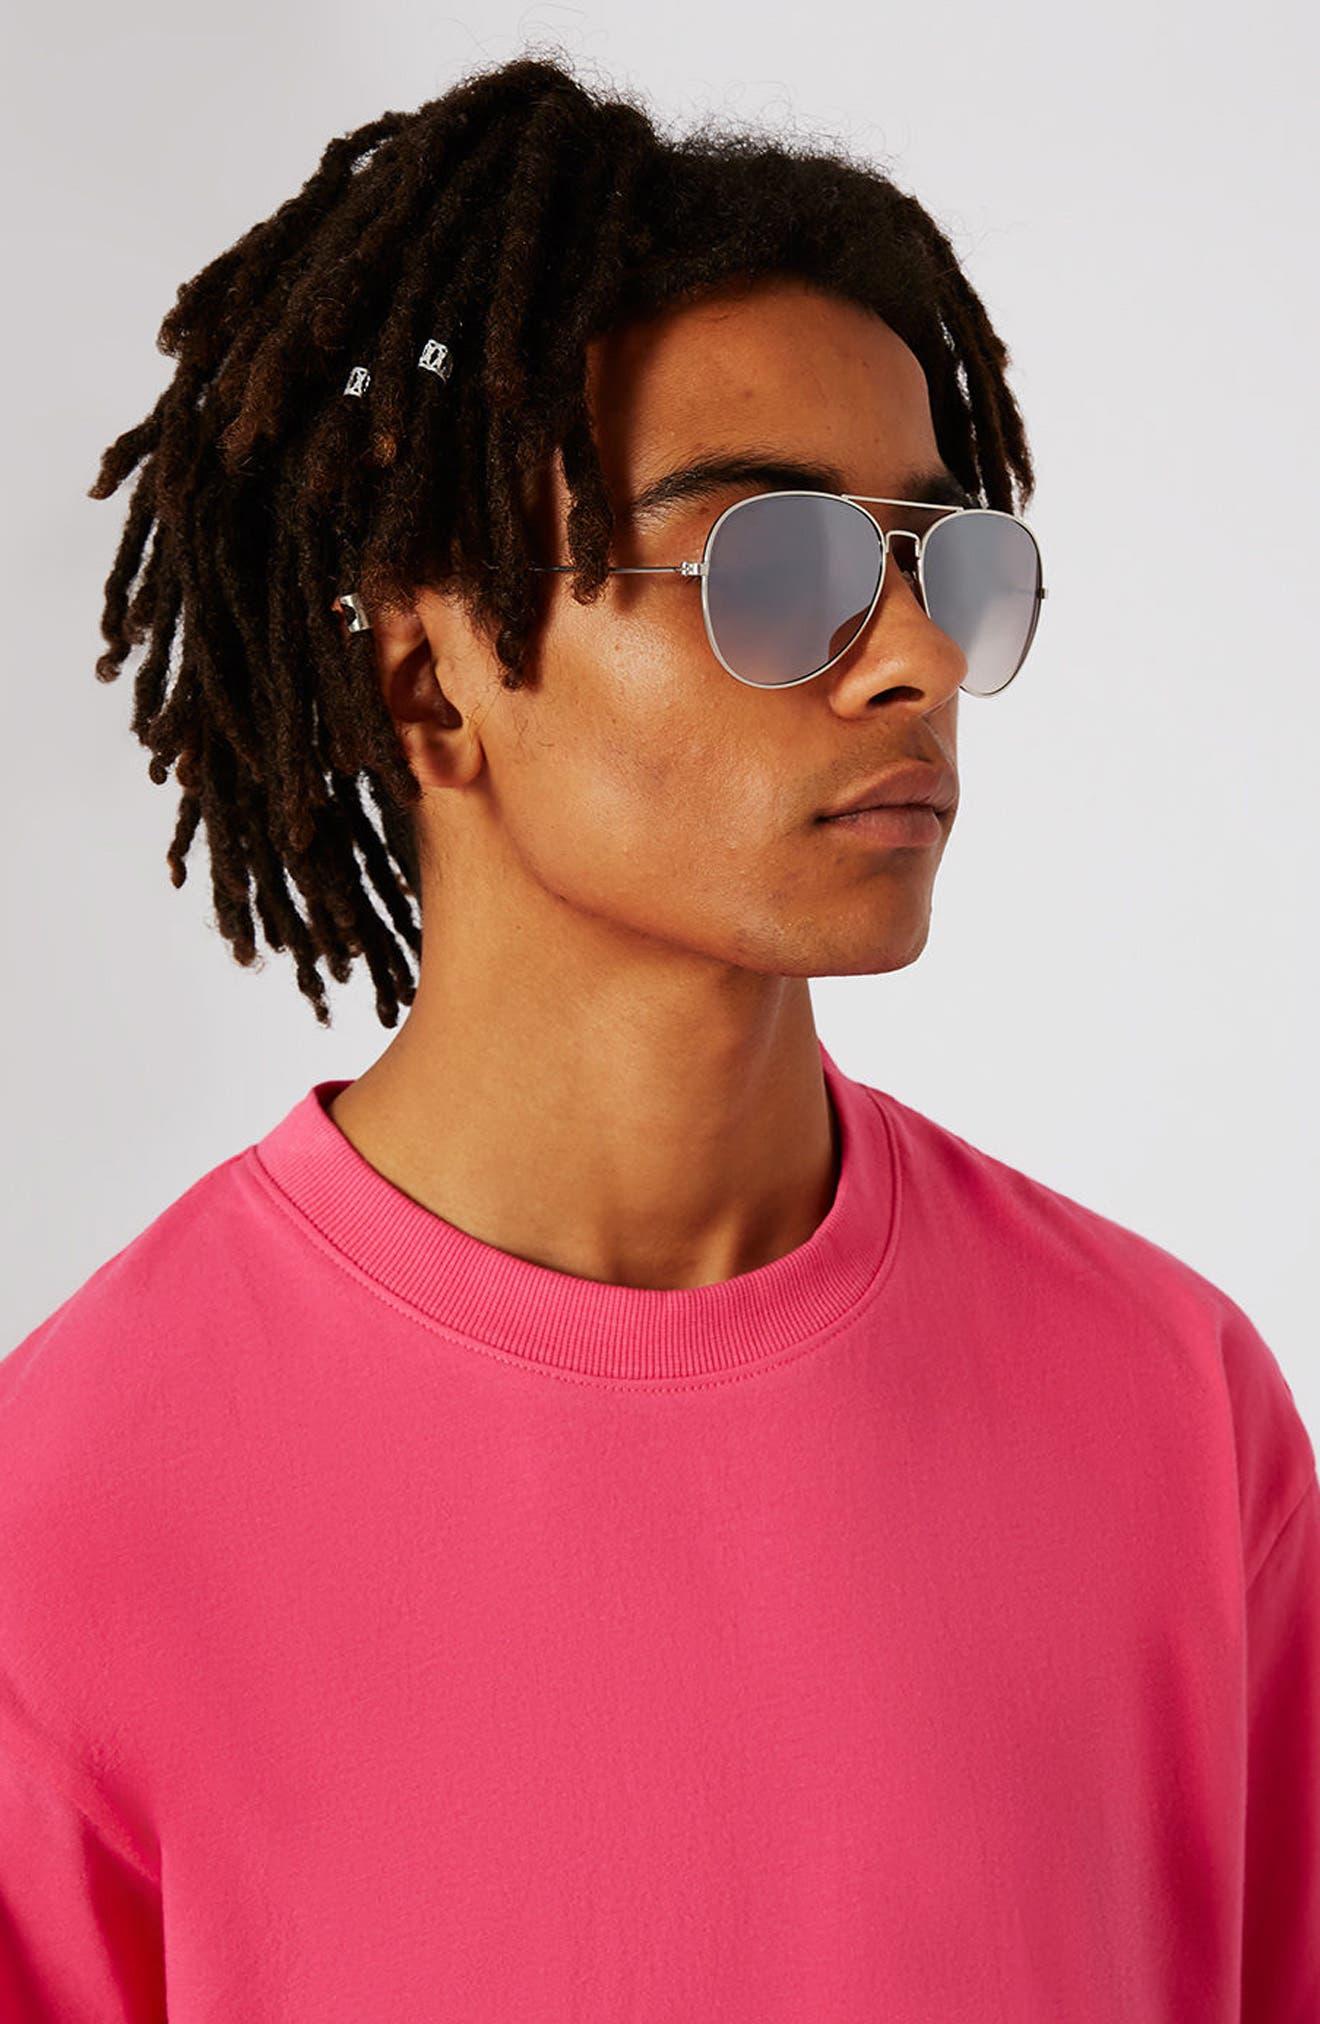 58mm Mirrored Aviator Sunglasses,                             Alternate thumbnail 2, color,                             Metallic Silver